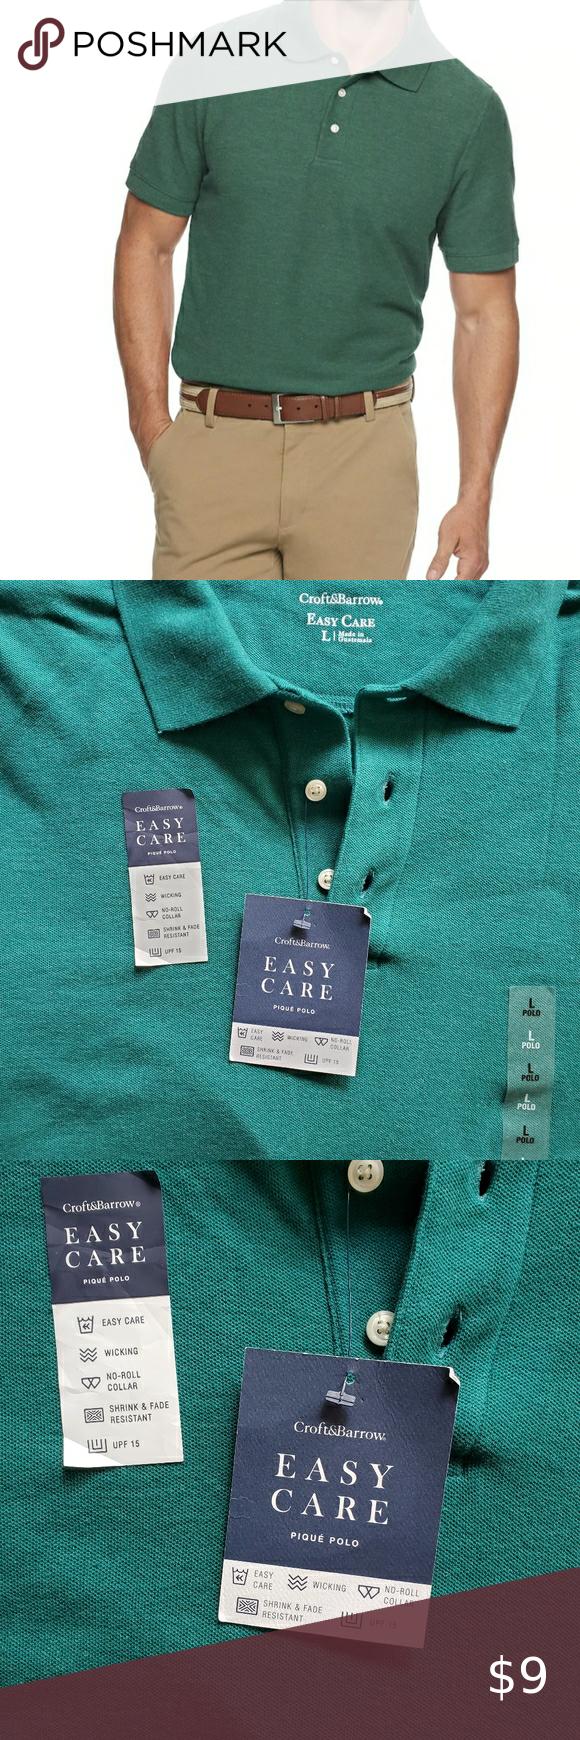 Men S Green Polo Shirt Size M Green Polo Shirts Mens Green Polo Shirt